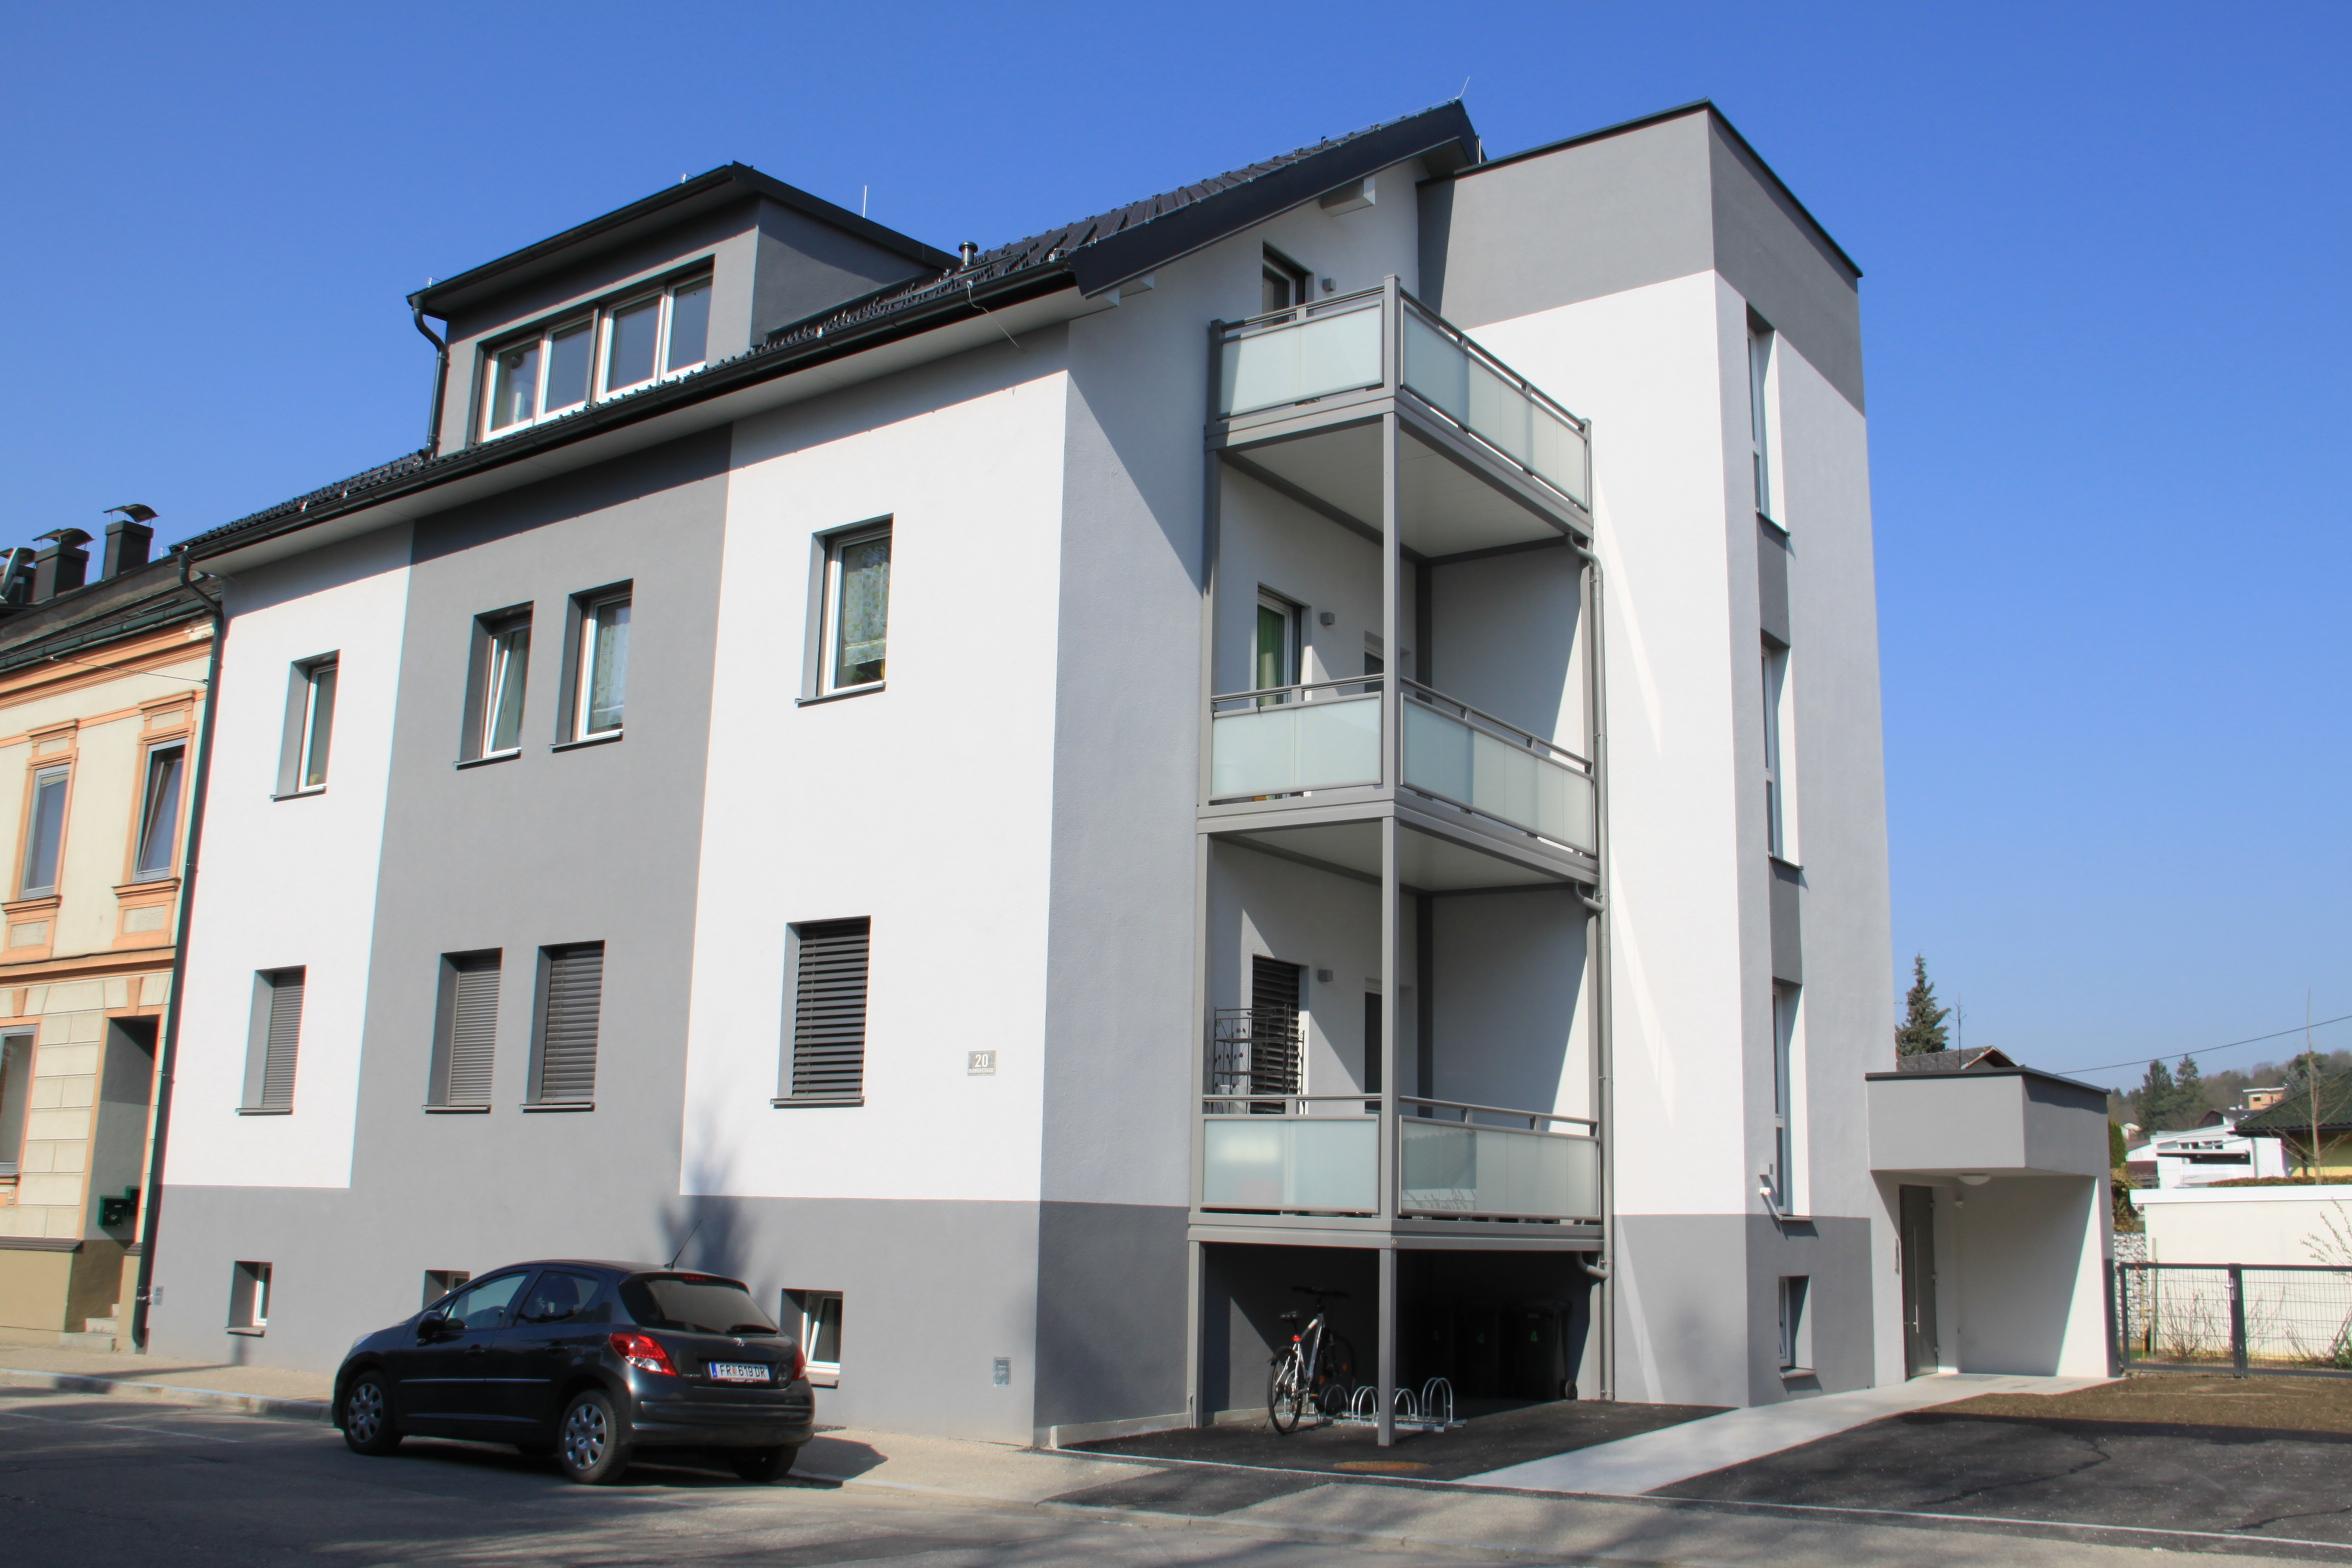 http://www.der-bauberater.at/wp-content/uploads/2017/10/Mehrfamilienhaus_01.jpg